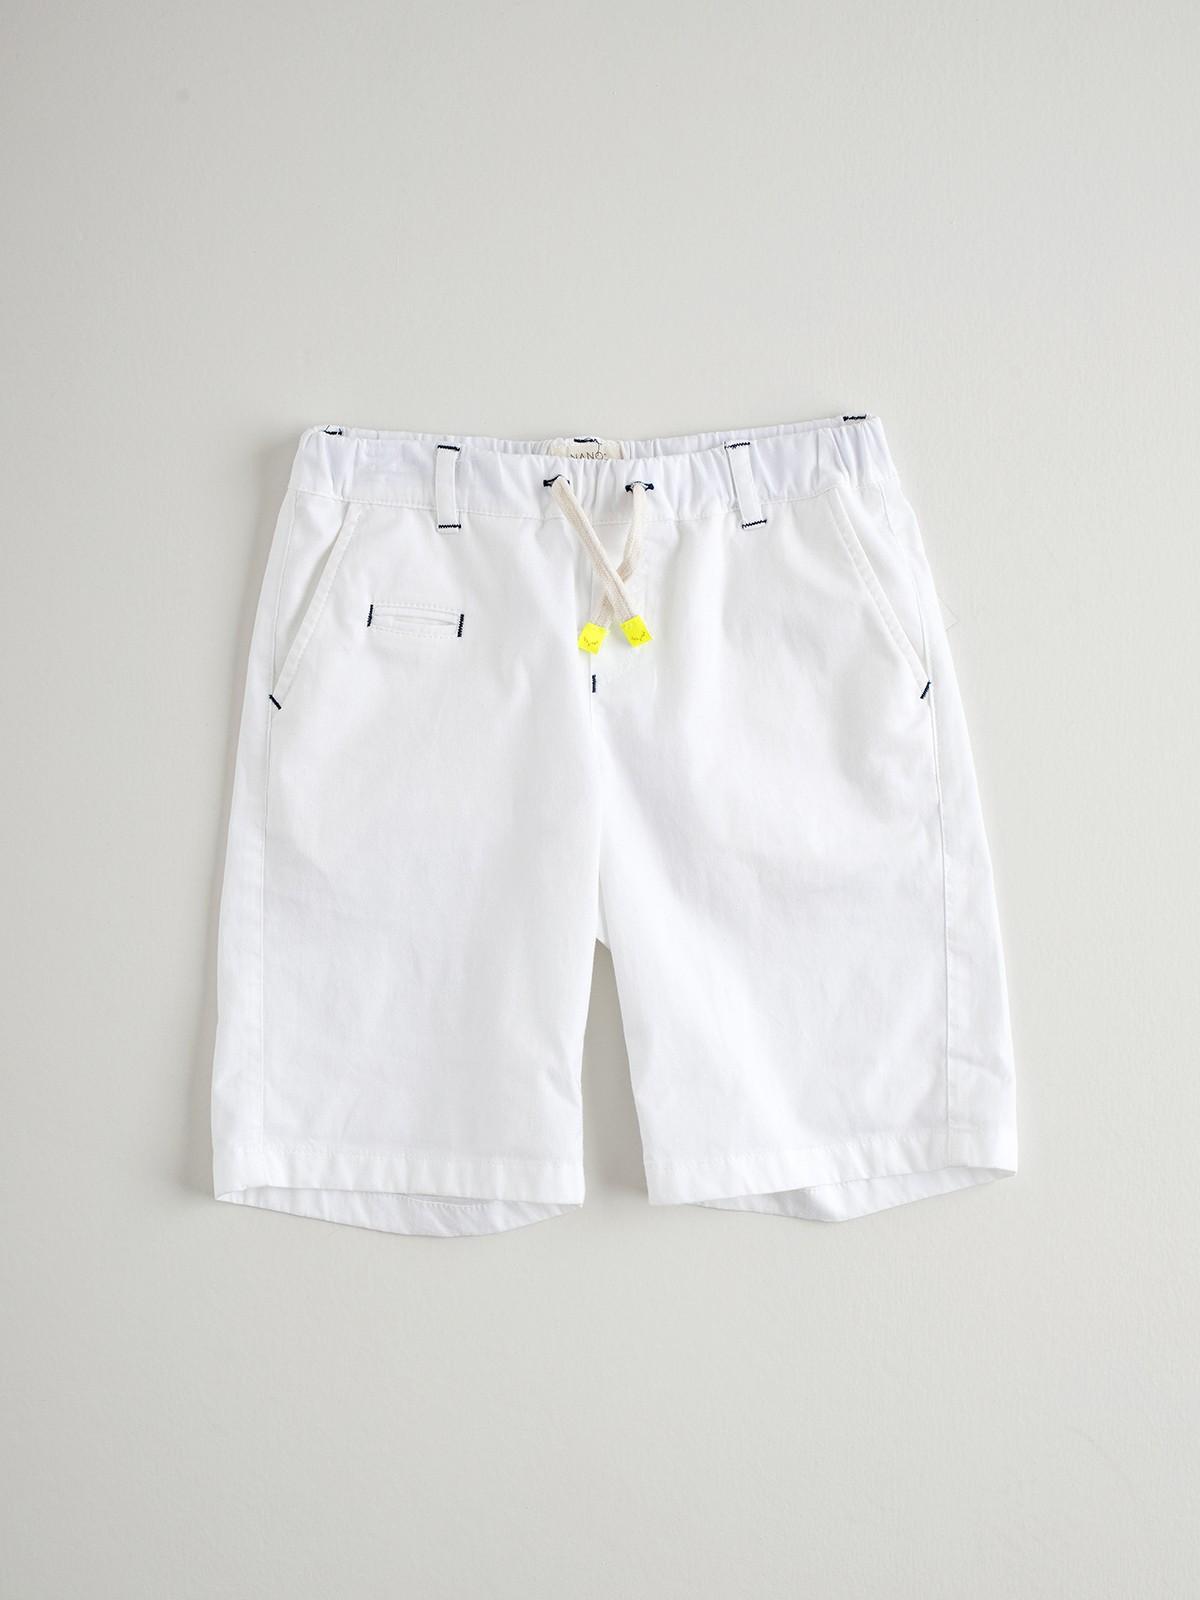 NANOS 白色抽繩短褲